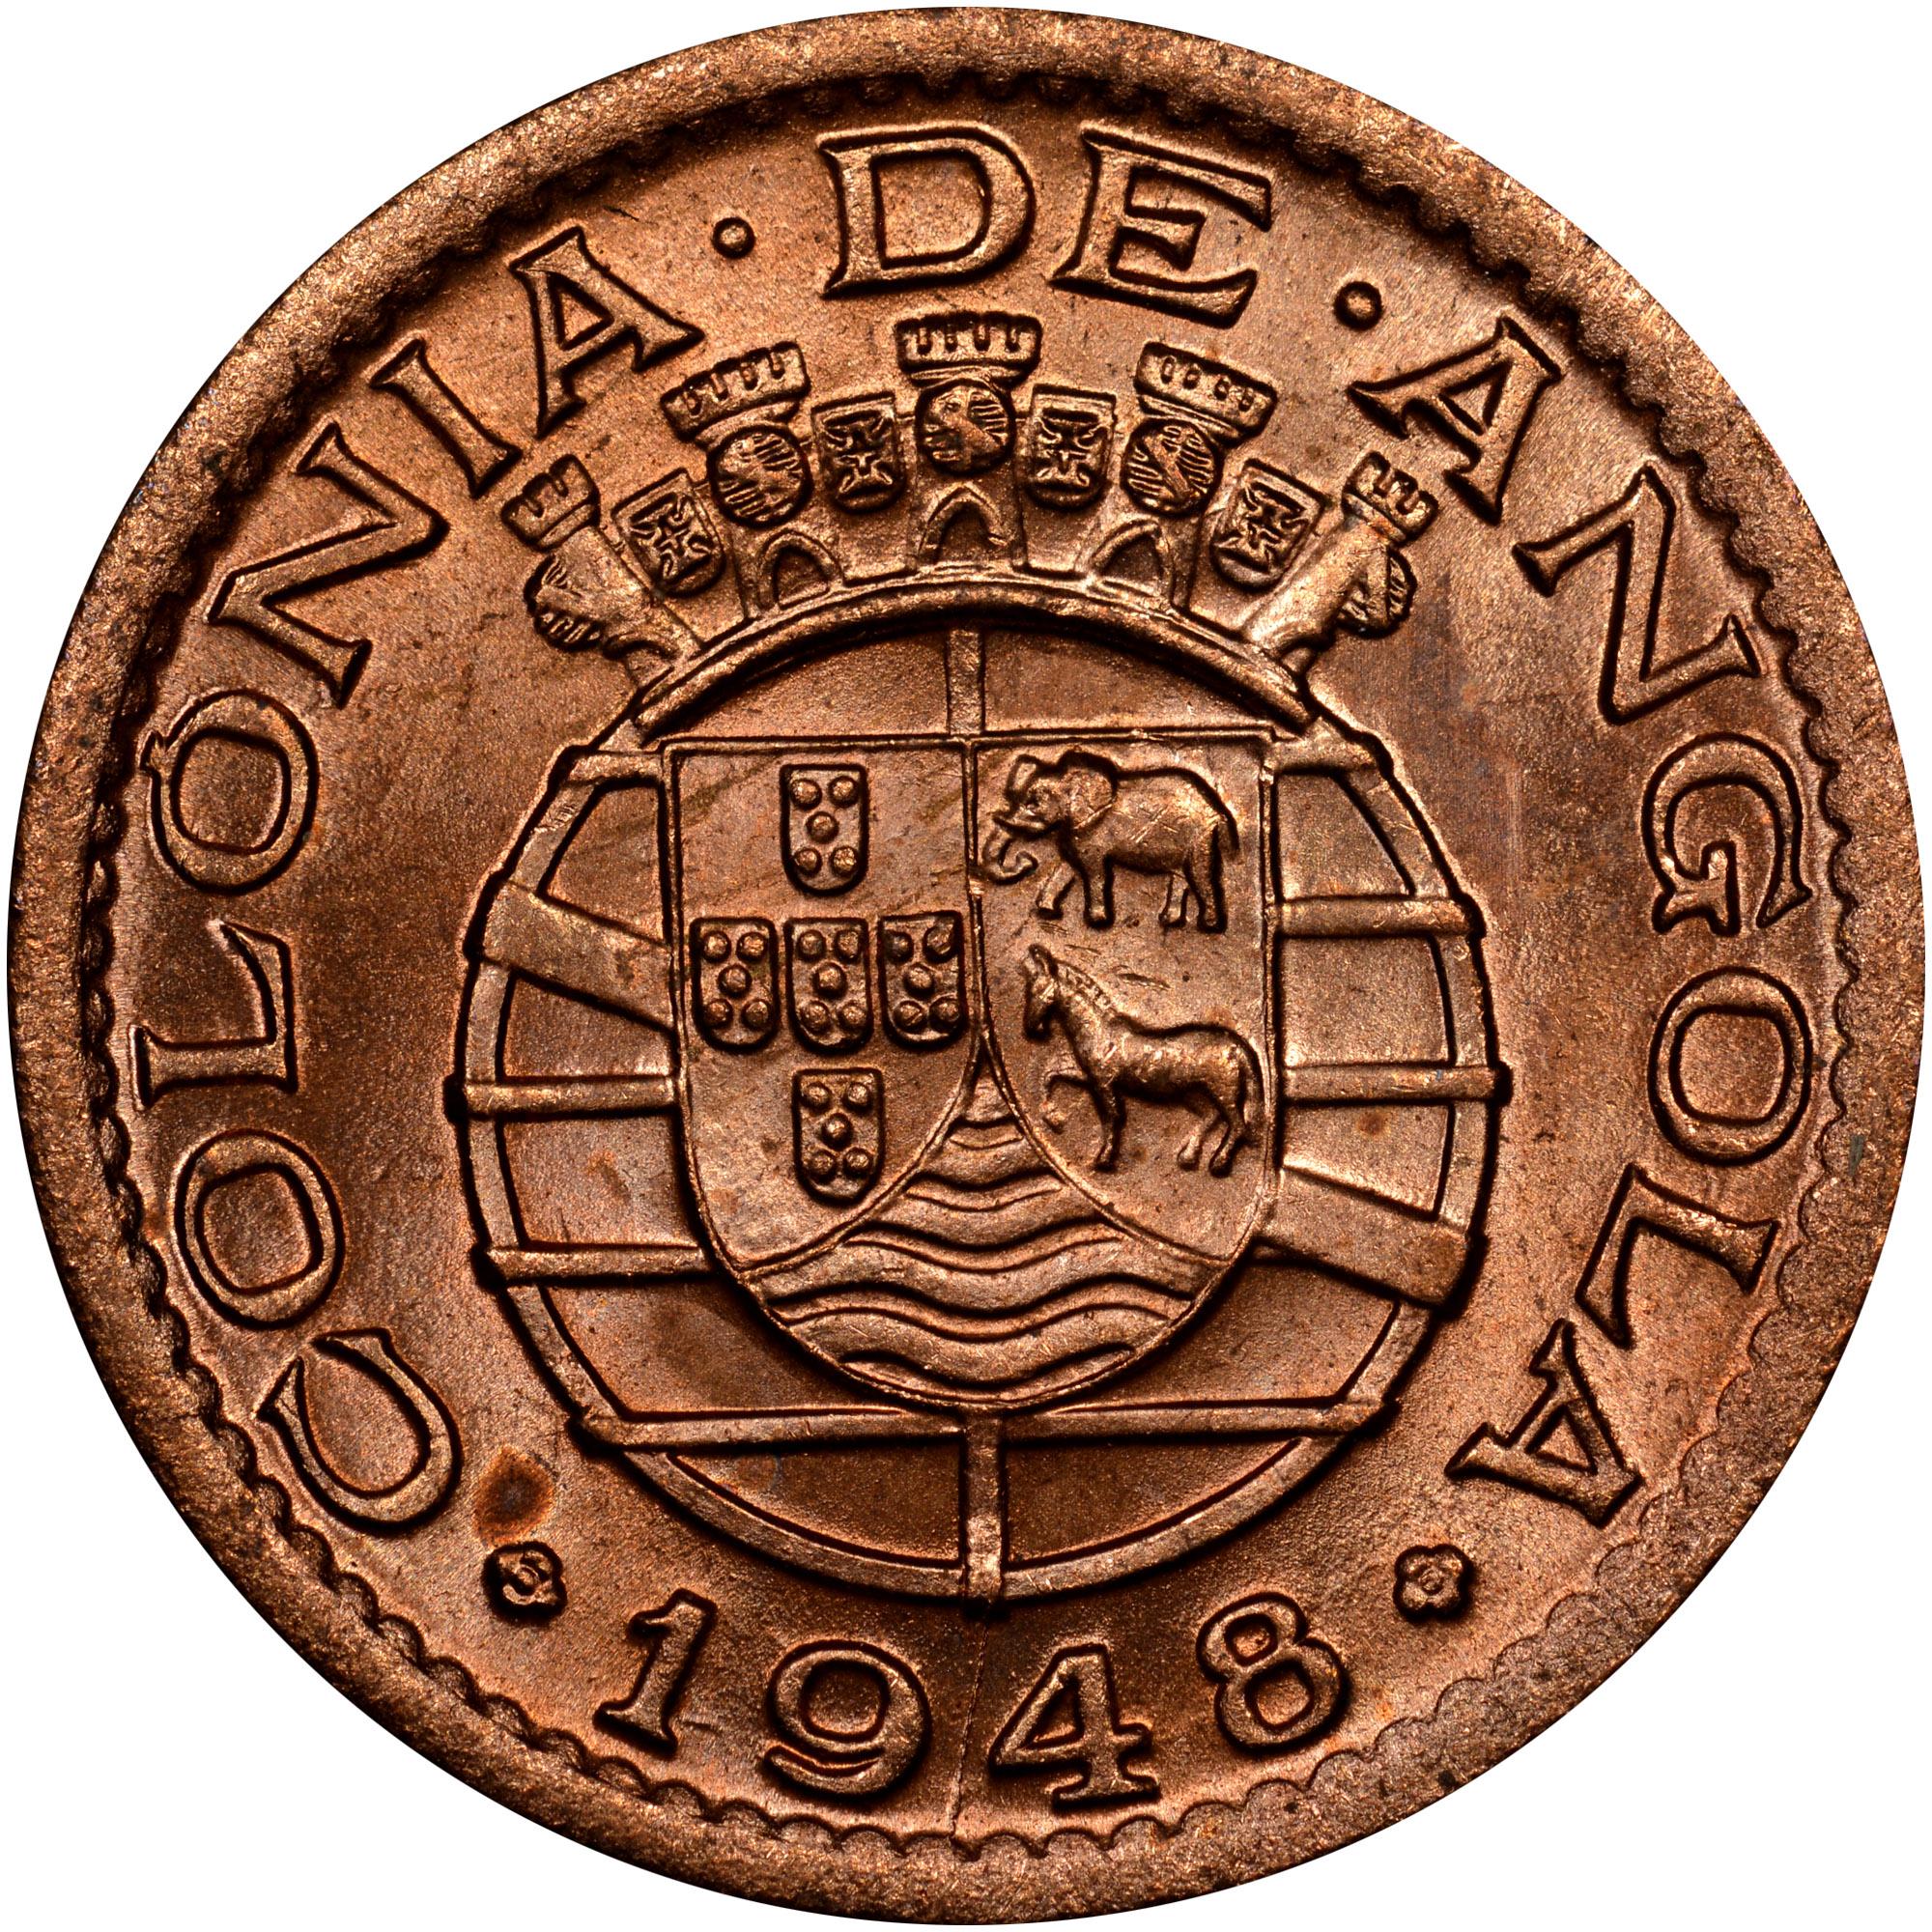 1948-1949 Angola 20 Centavos reverse